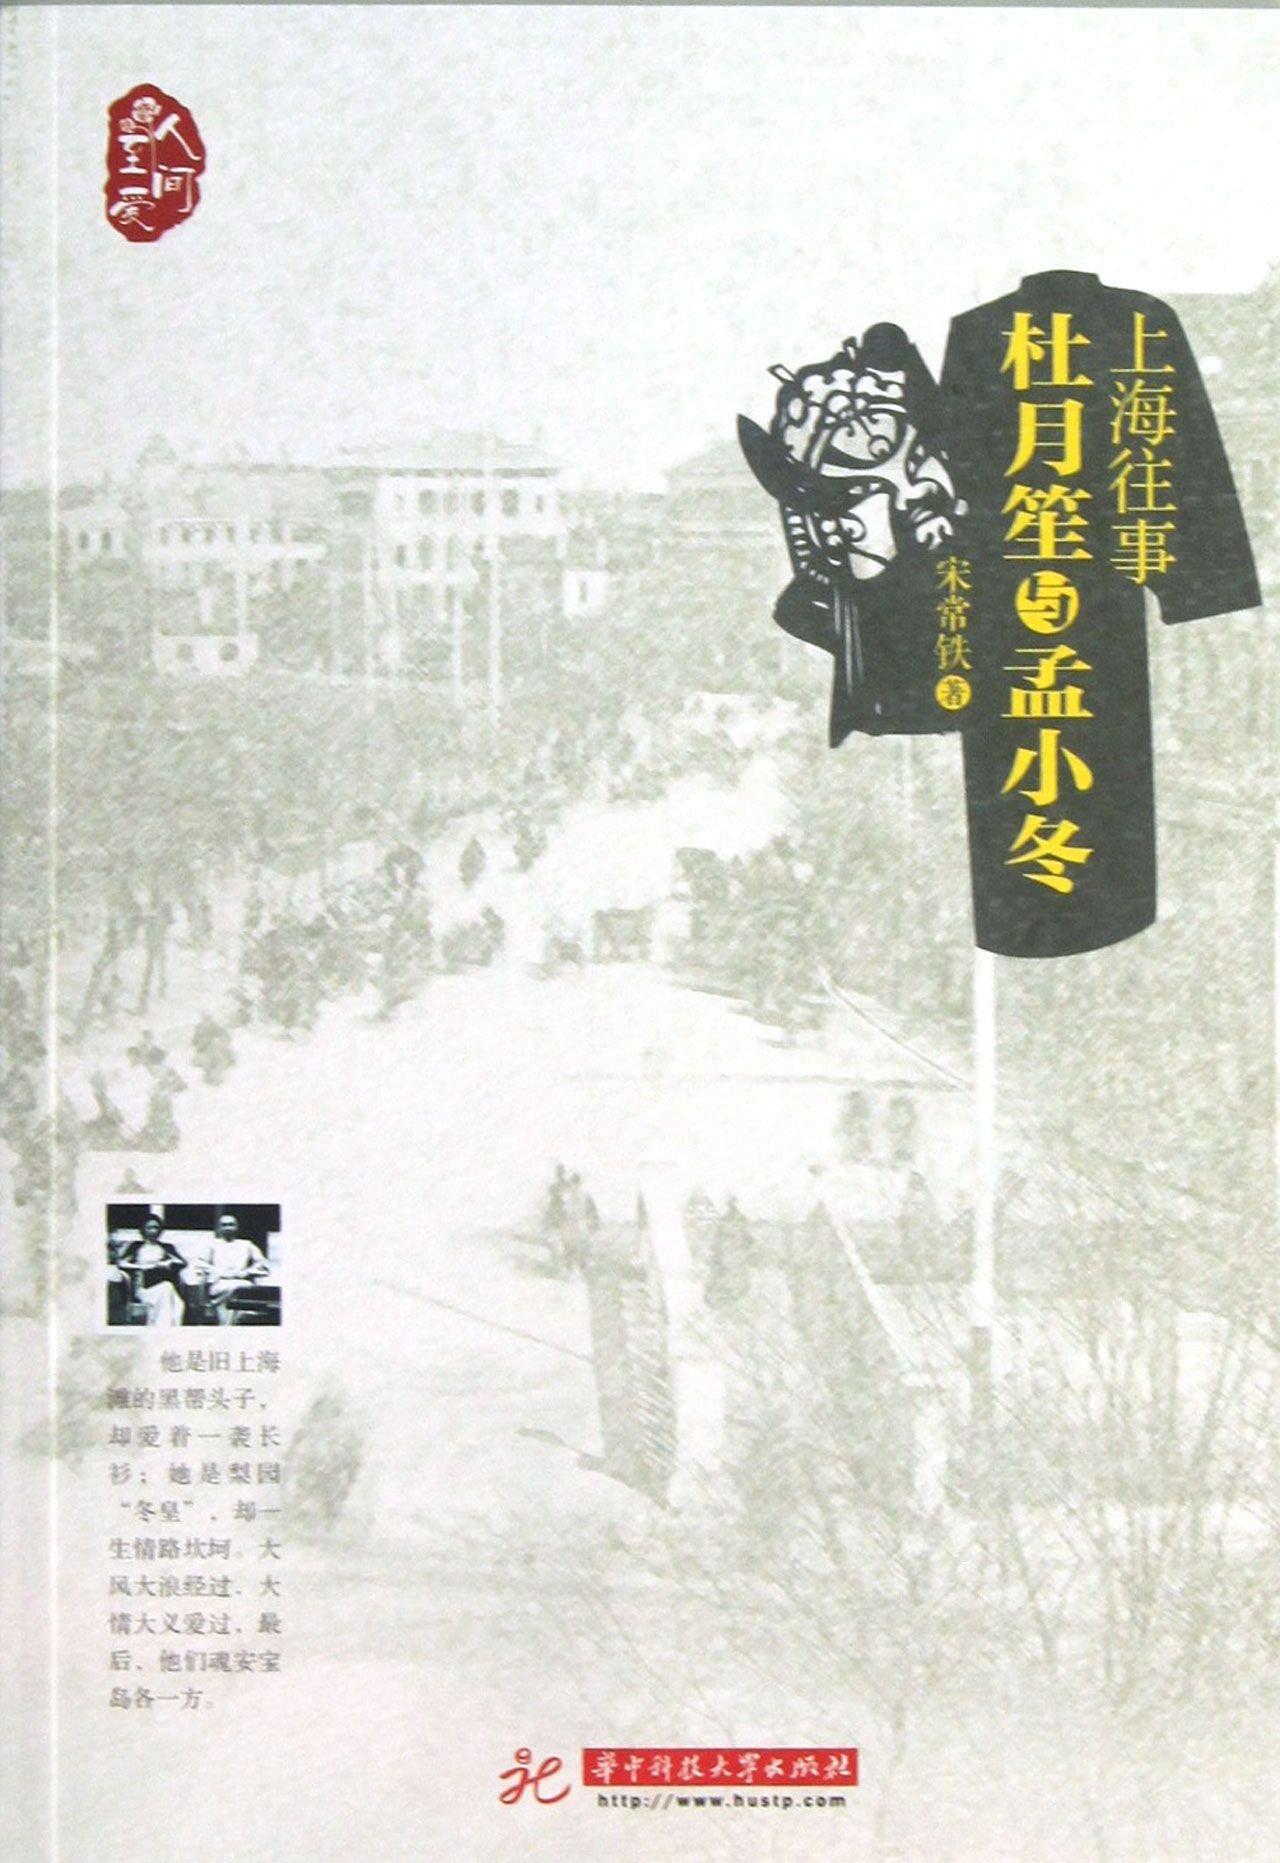 Memories of Shanghai (Du Yusheng and Meng Xiaodong) (Chinese Edition) PDF